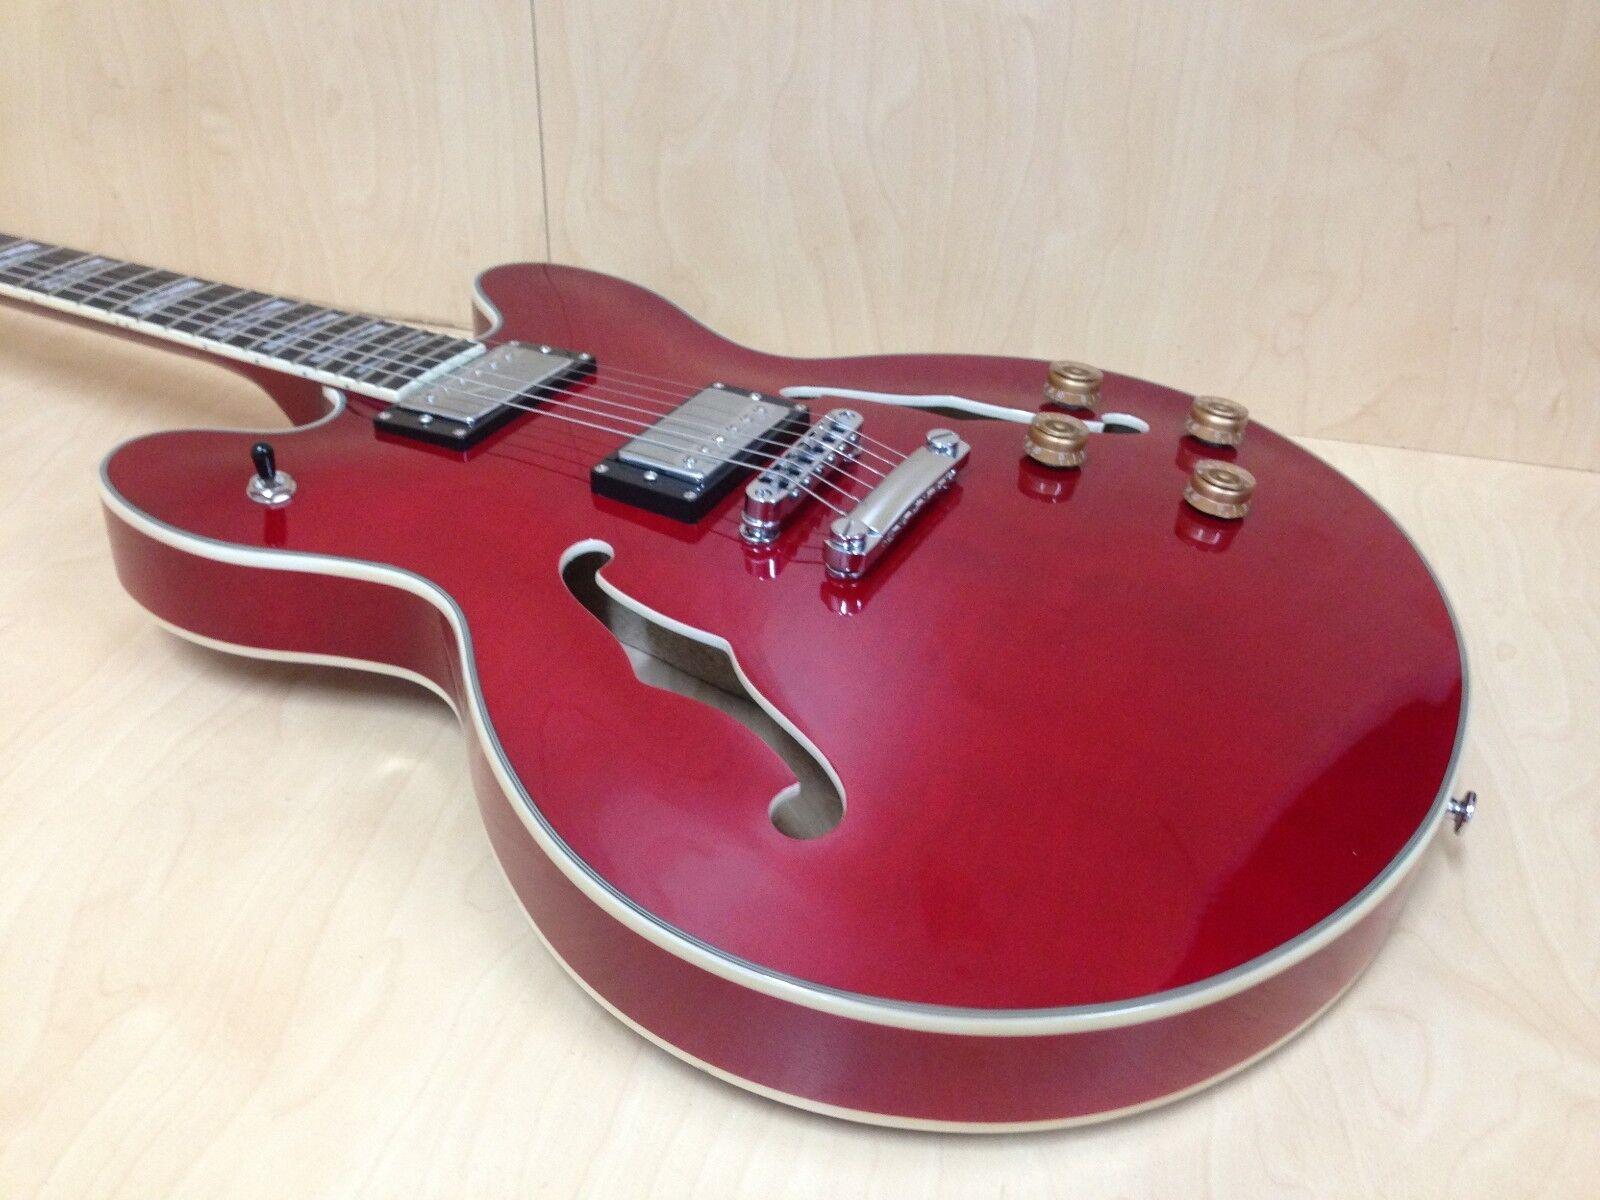 Haze ES-335 Estilo Guitarra Eléctrica Eléctrica Eléctrica Semi Hueco Rojo Cereza SEG-272 + bolsa Gig Bag GRATIS  Precio por piso